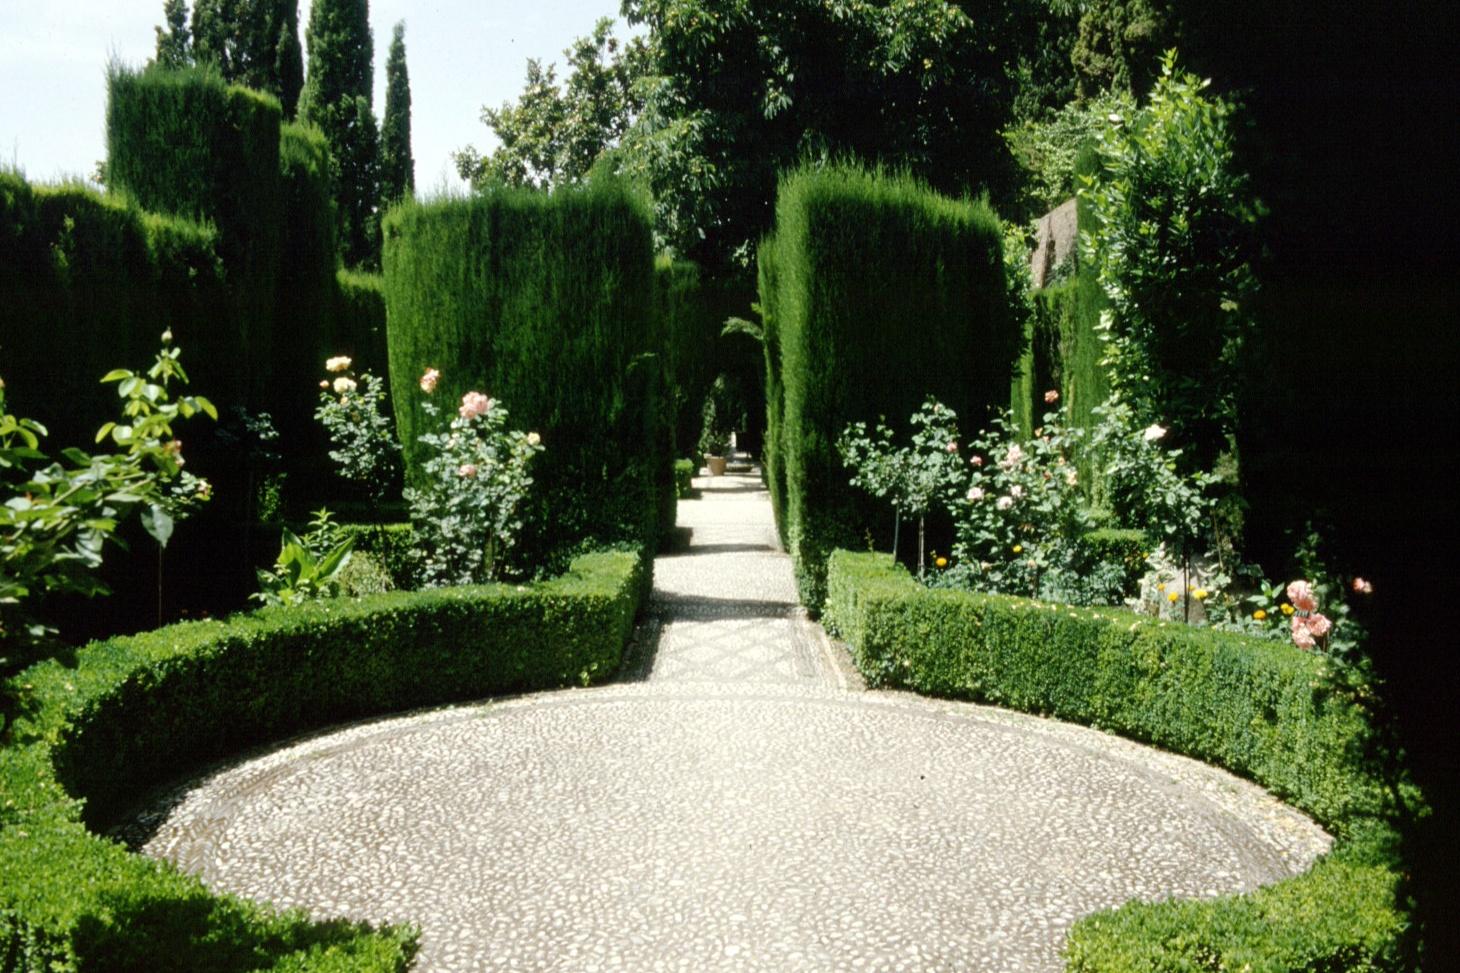 Yin / Yang in the Garden - A Landscape Design Tip Yin Yang Labyrinth Garden Designs Html on